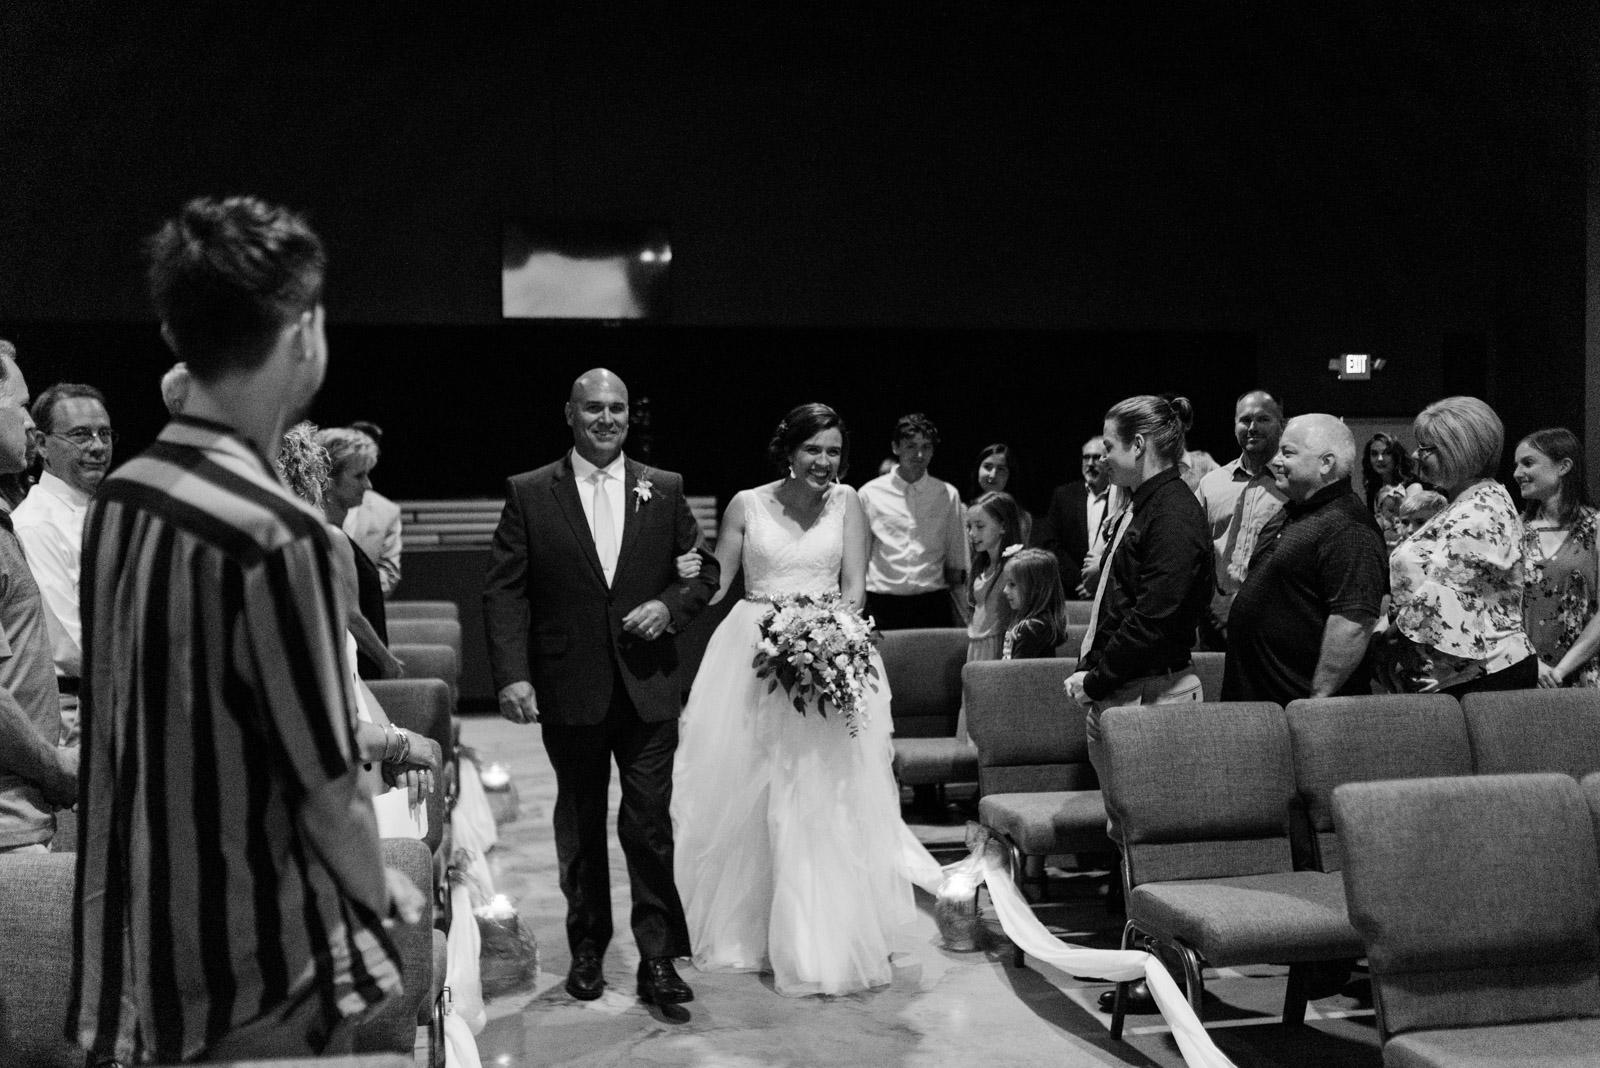 bride walking down aisle veritas church Iowa City wedding ceremony